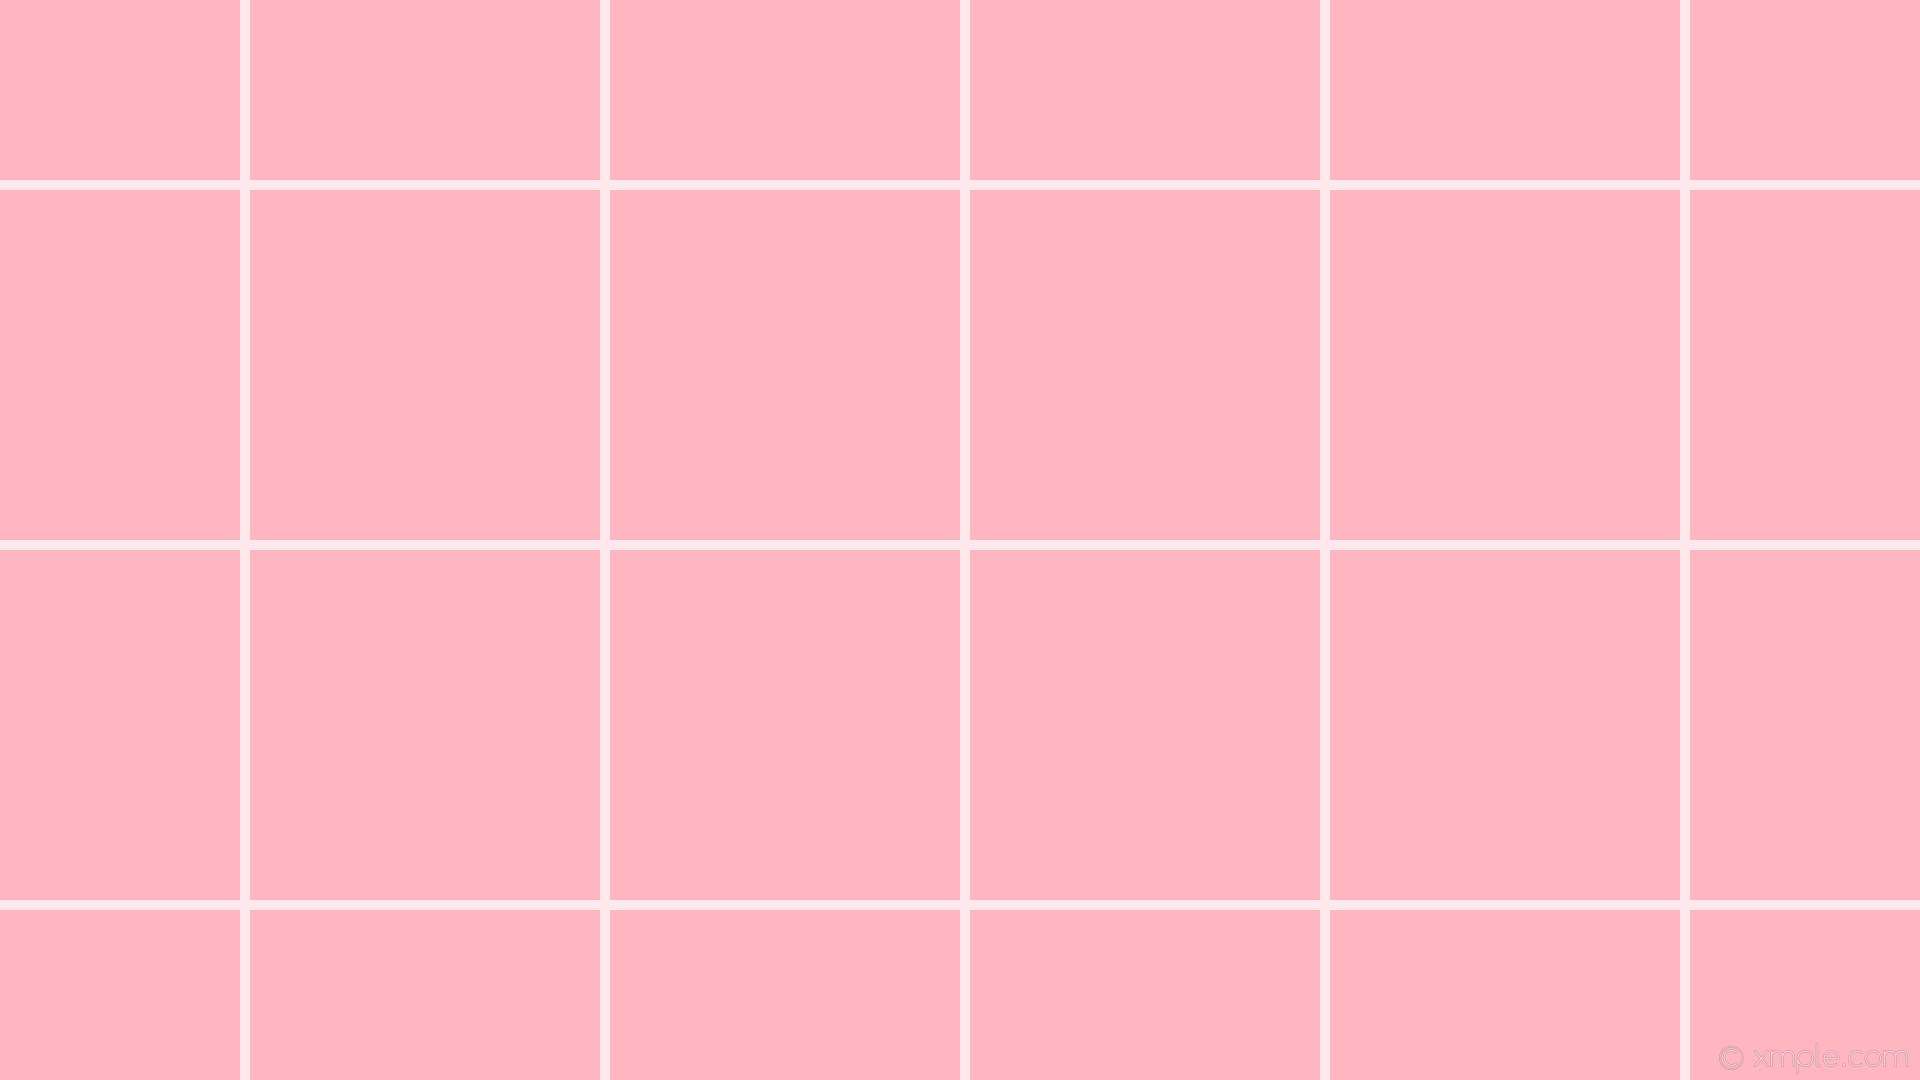 Cozy Cute Pixel Art Grid Hd Wallpaper Background Images